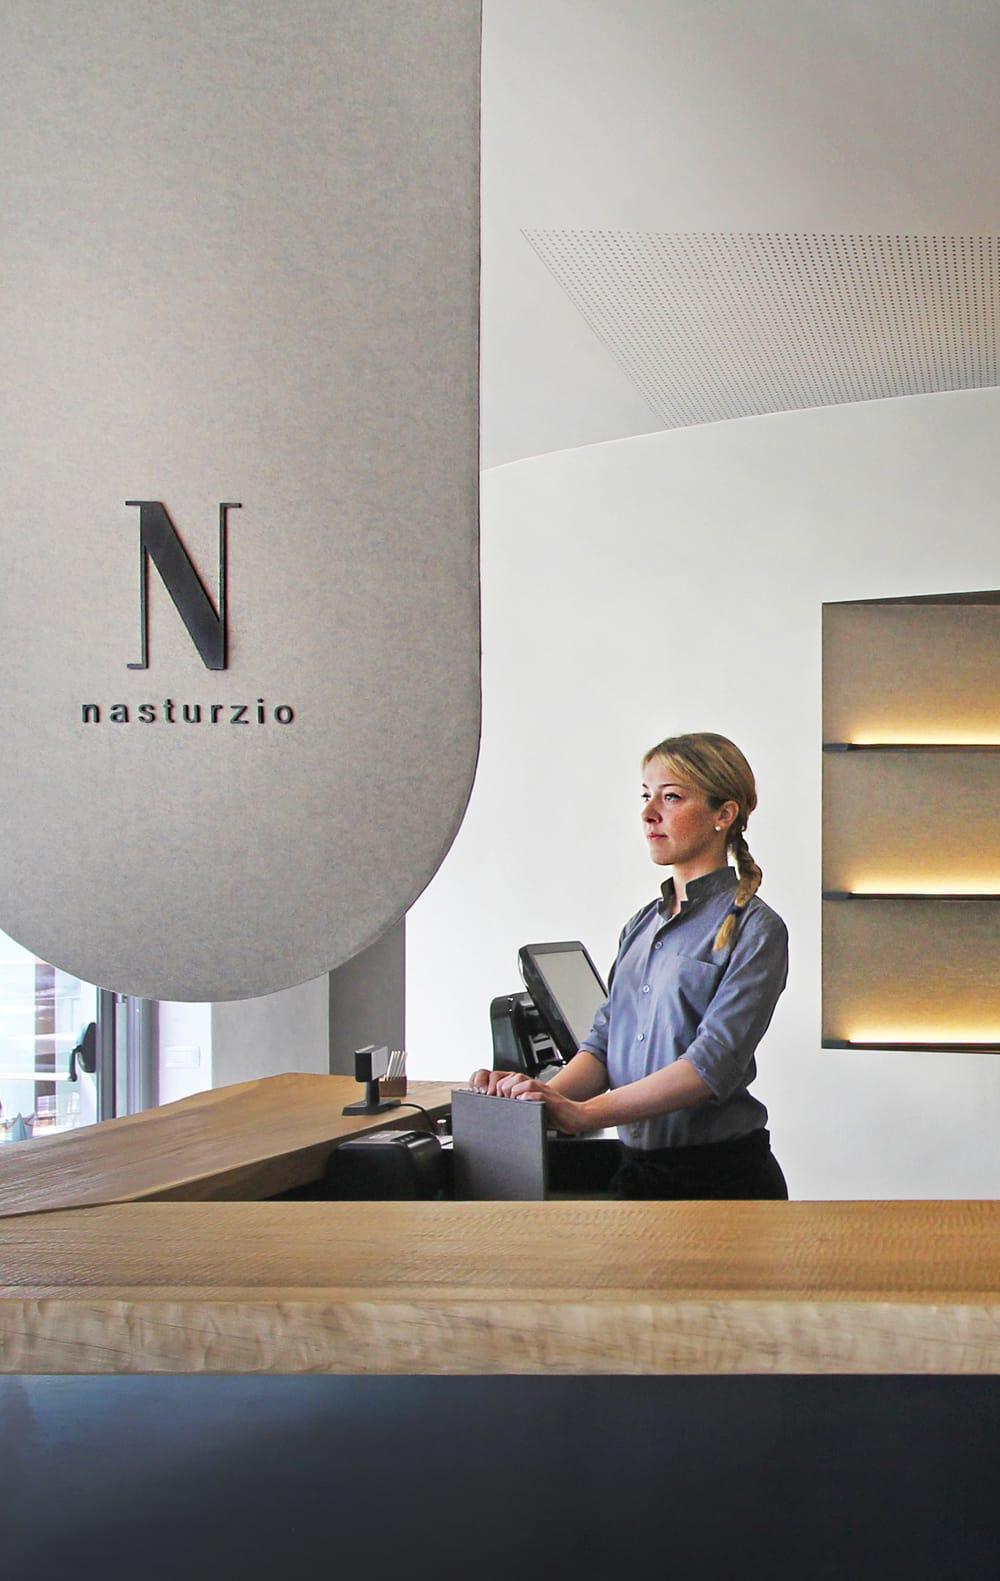 1_Francesca Perani and Arianna Foresti_Nasturzio Restaurant_Inspirationist